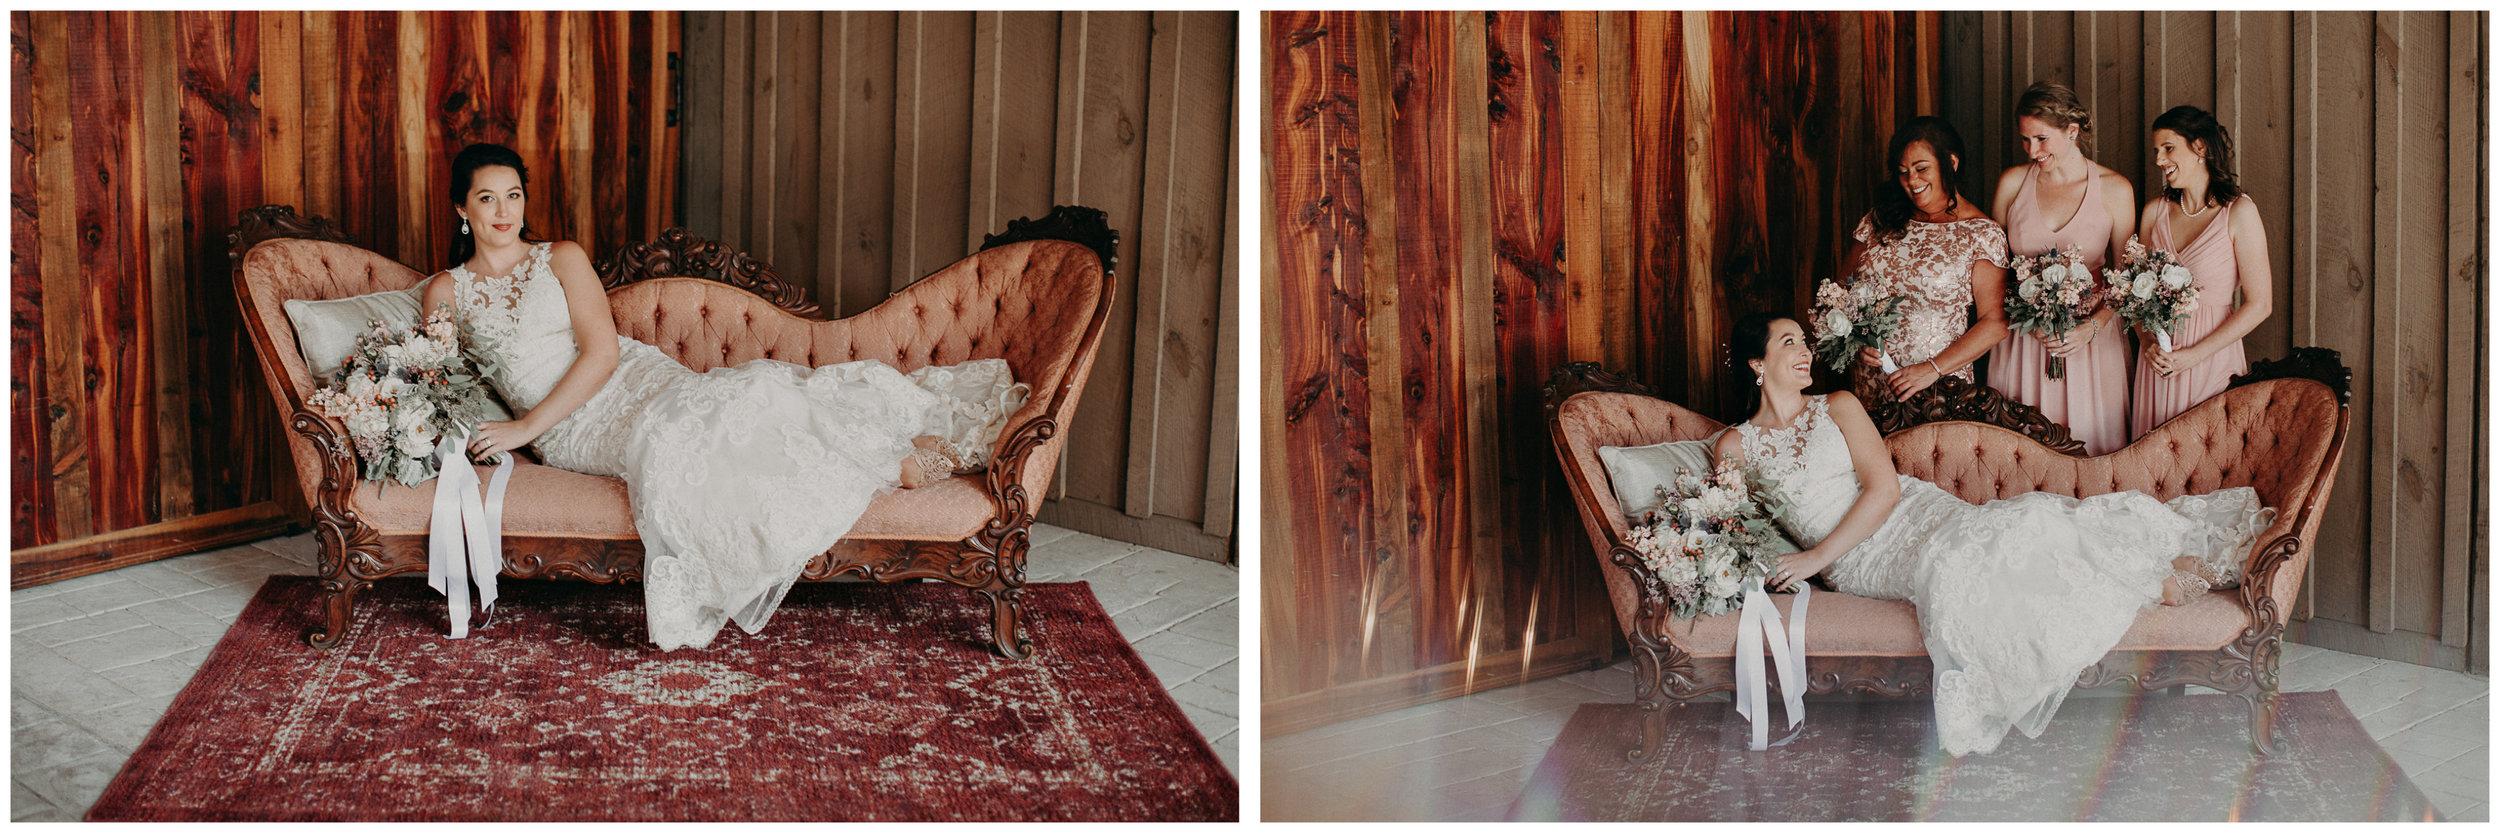 50 wedding day portraits bride and groom atlanta - georgia - ga wedding photographer .jpg